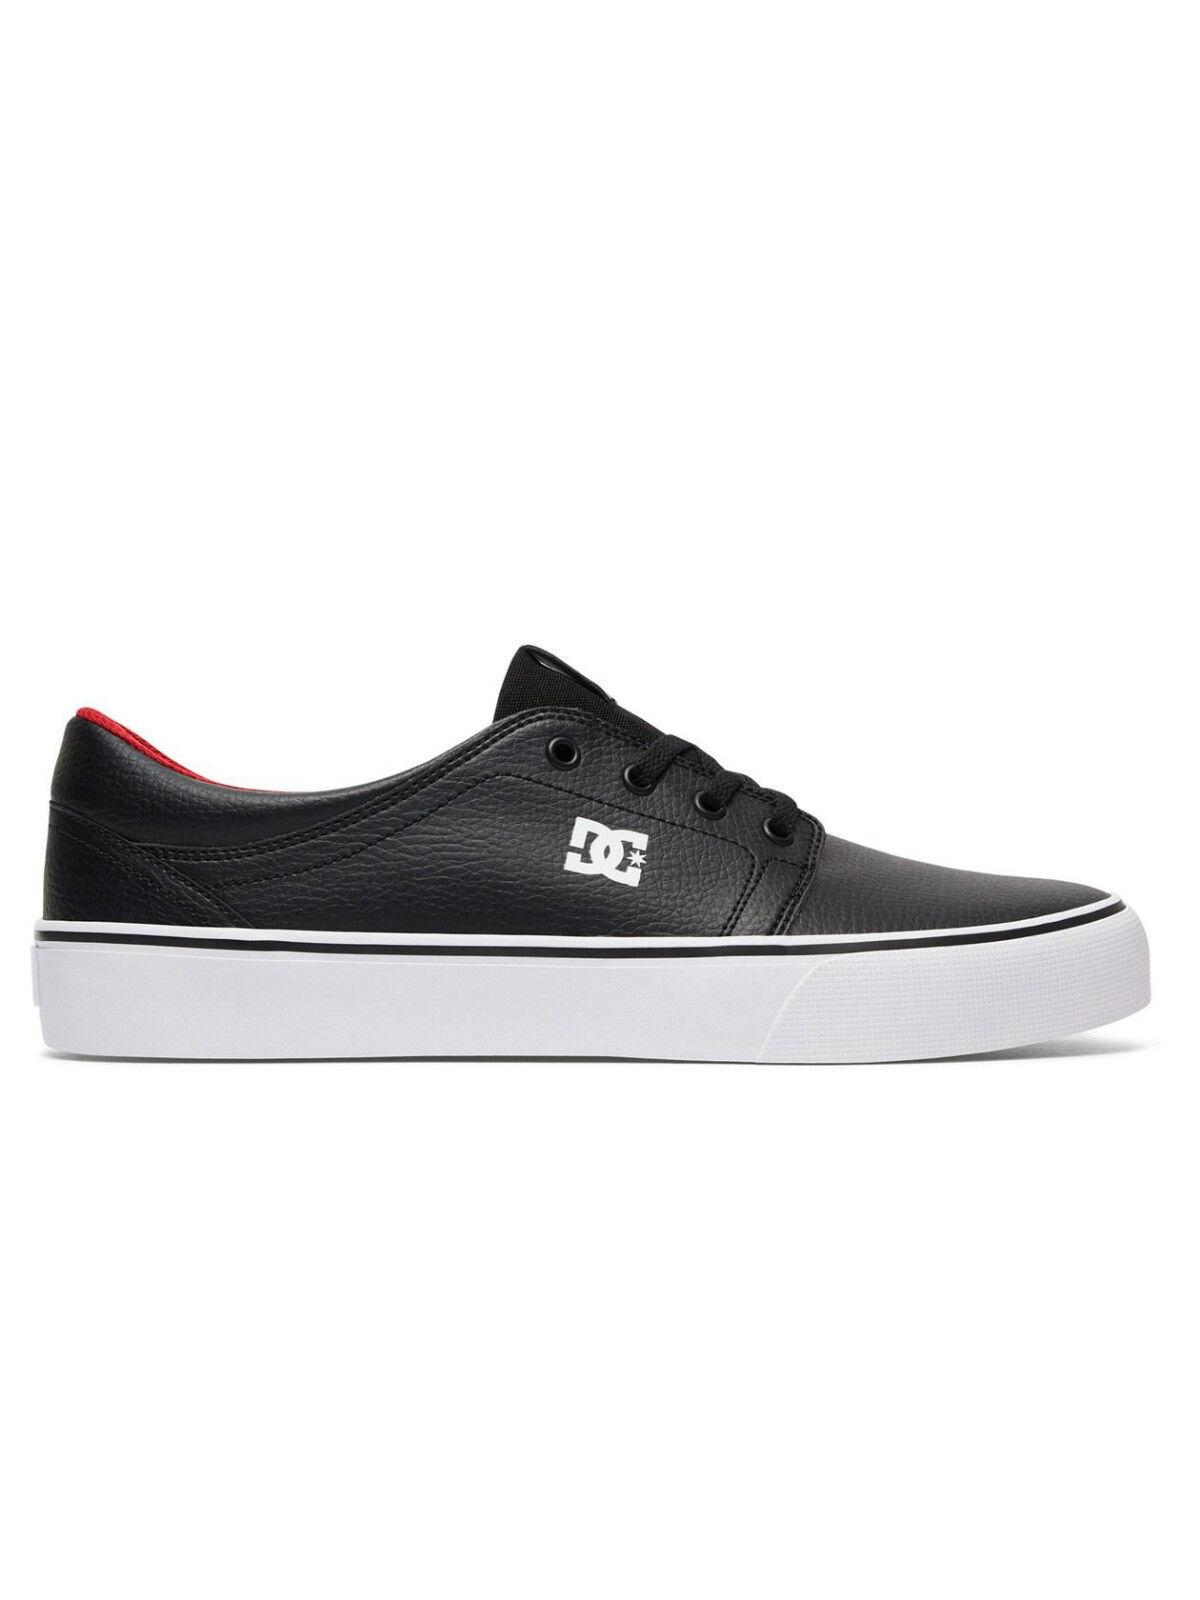 DC BLACK Schuhe  Herren TRAINERS.TRASE BLACK DC LEATHER SKATE Schuhe RUBBER SOLE 7W 00402 XKRW cb4697